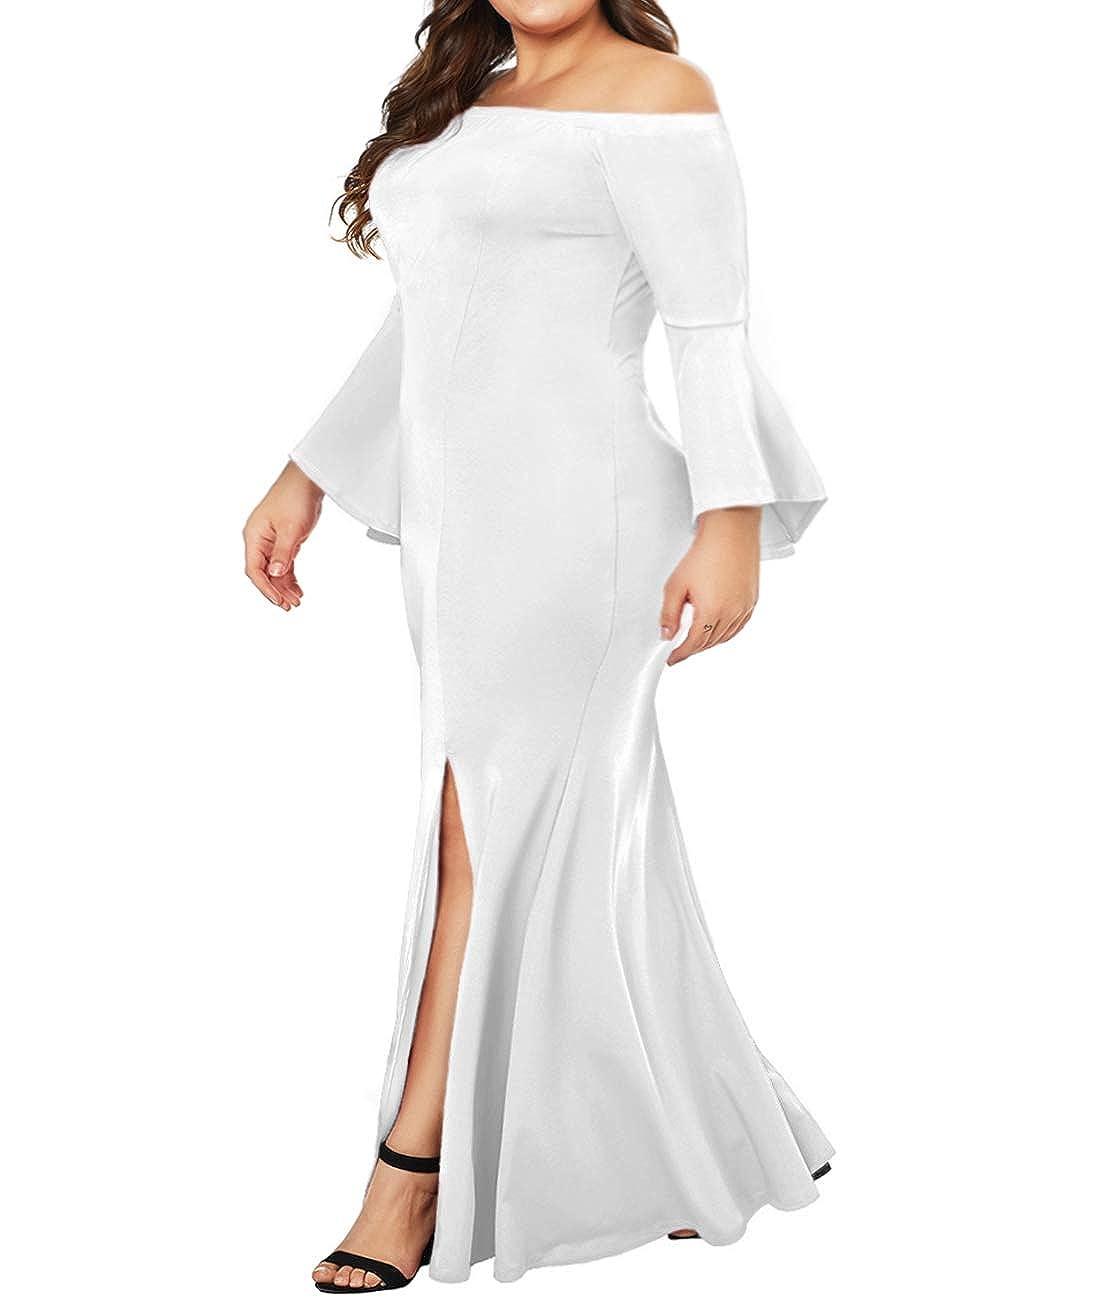 746bdf2635e Amazon.com: Innerger Women Plus Size Off Shoulder Bodycon Party Dress  Evening Formal Gown White XXXXL: Clothing